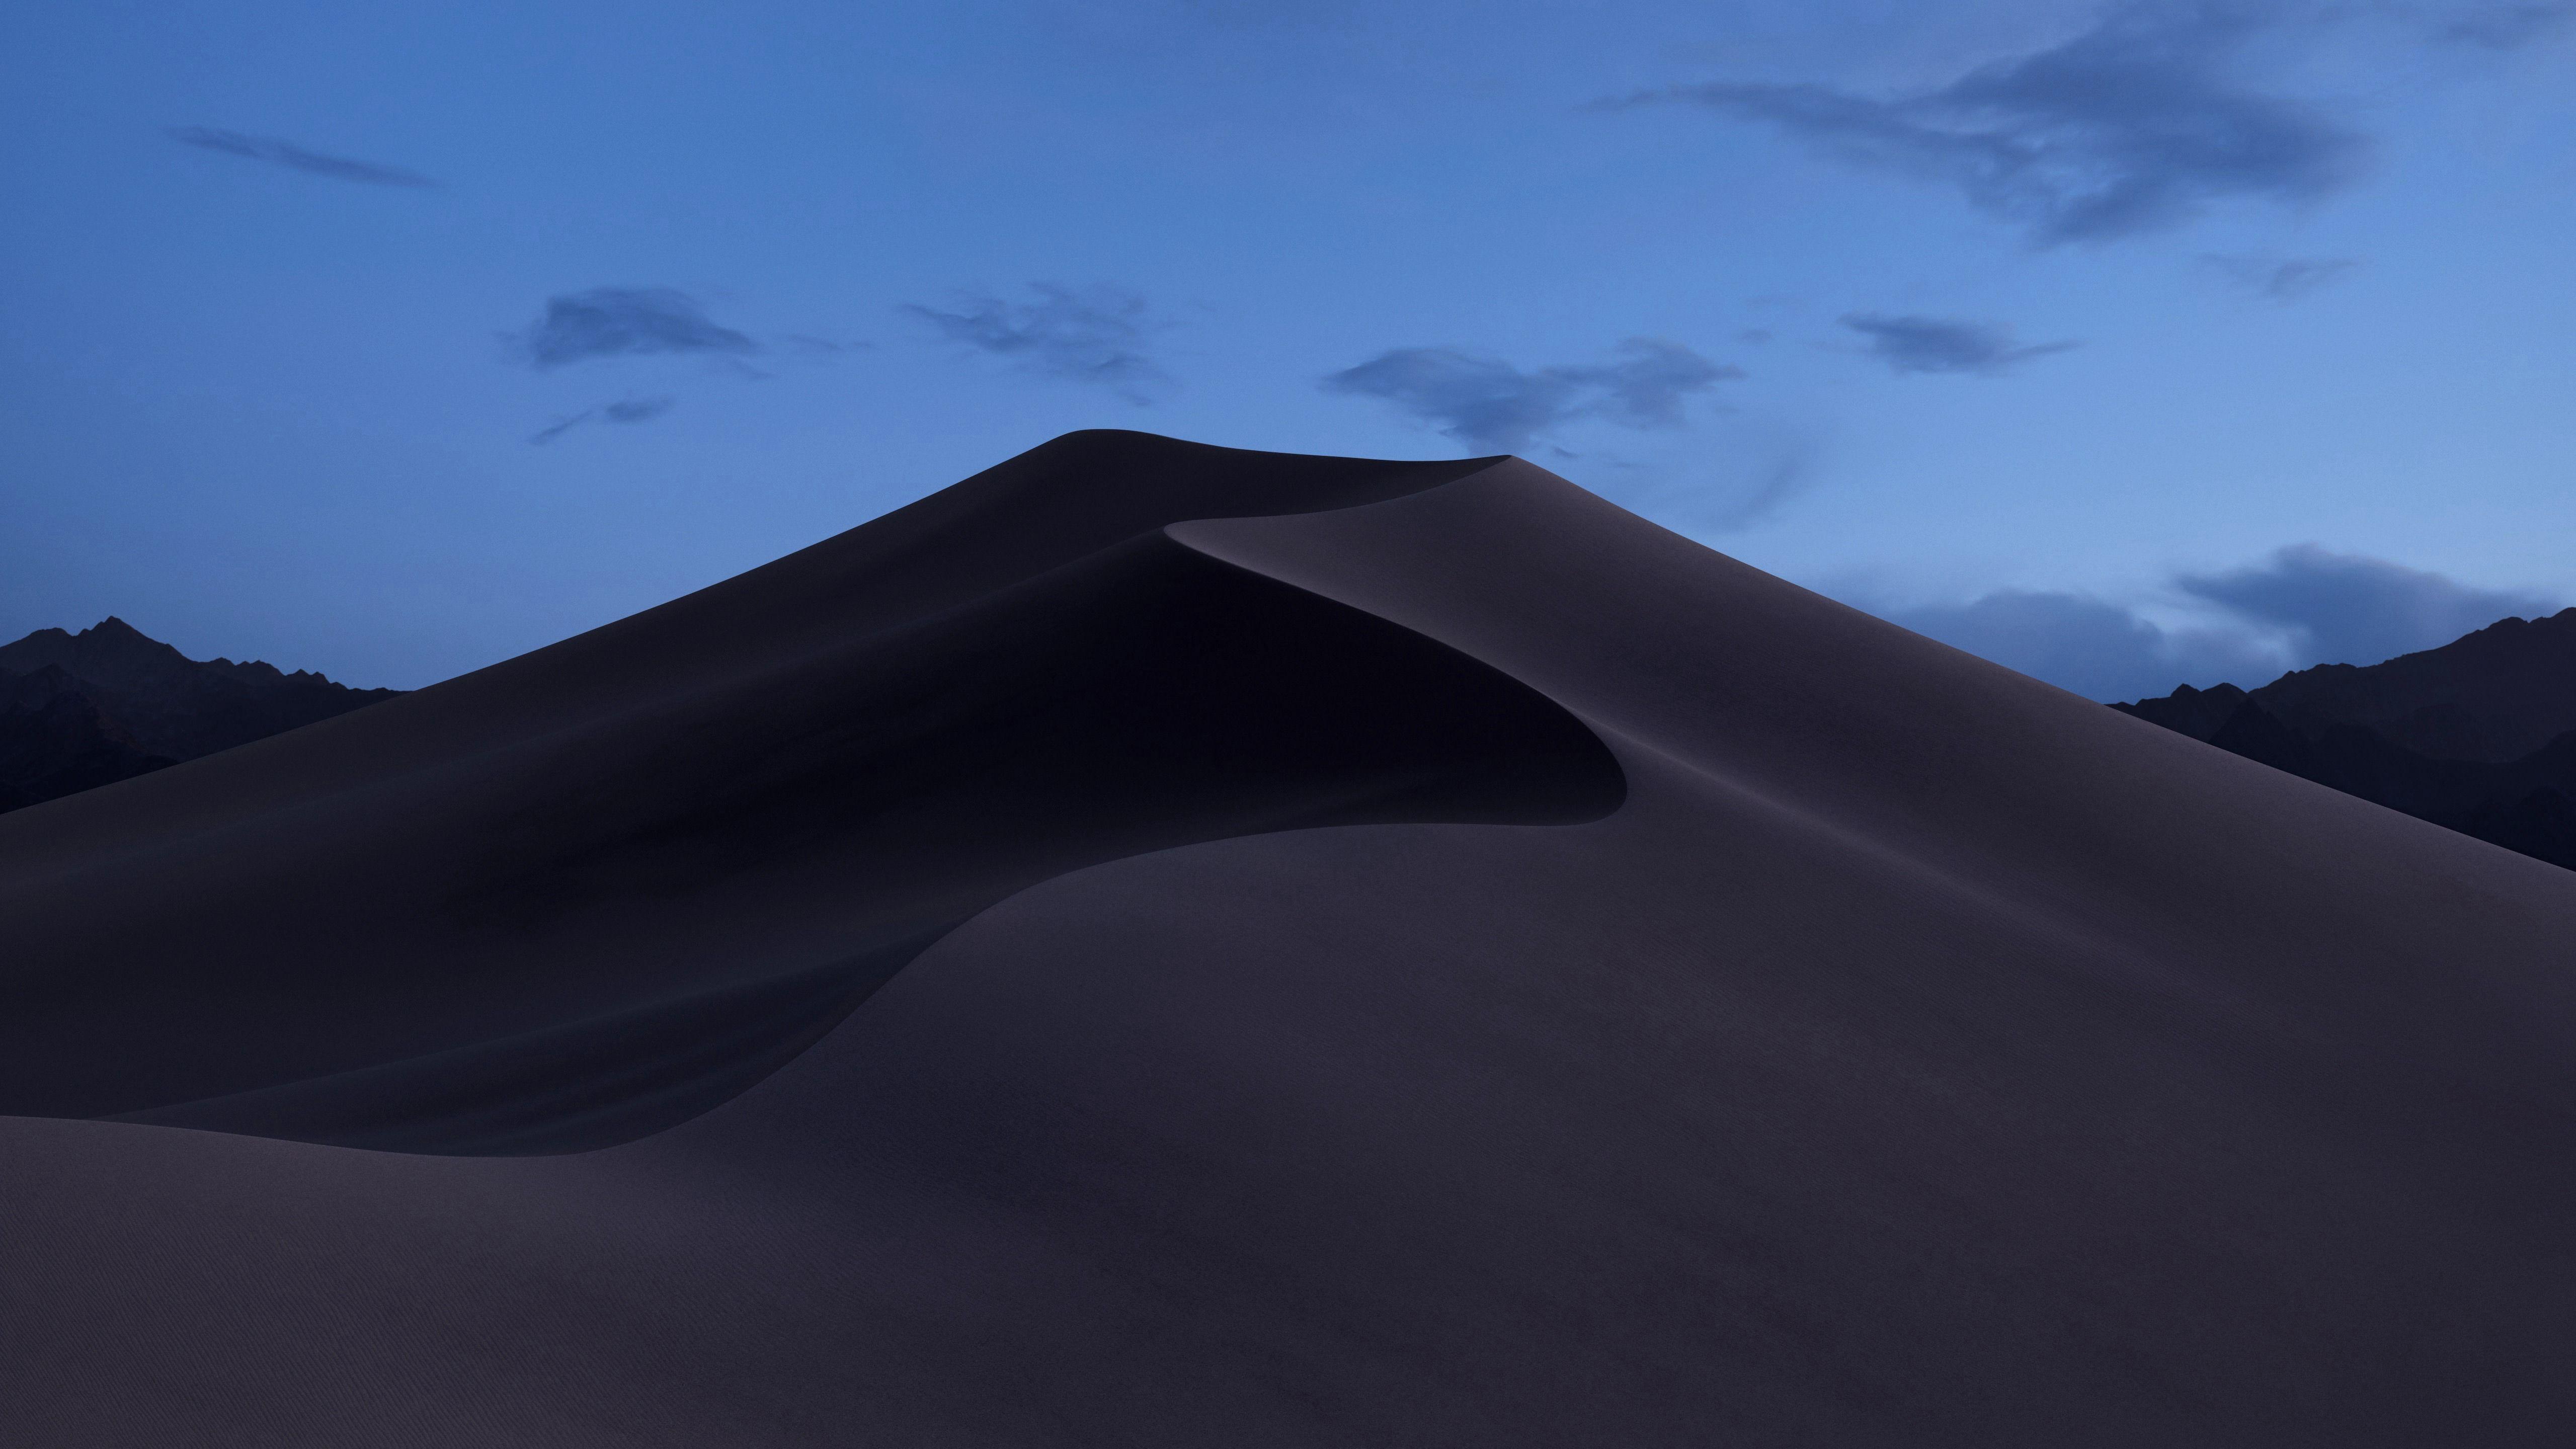 Mac Os Mojave Wallpapers Top Free Mac Os Mojave